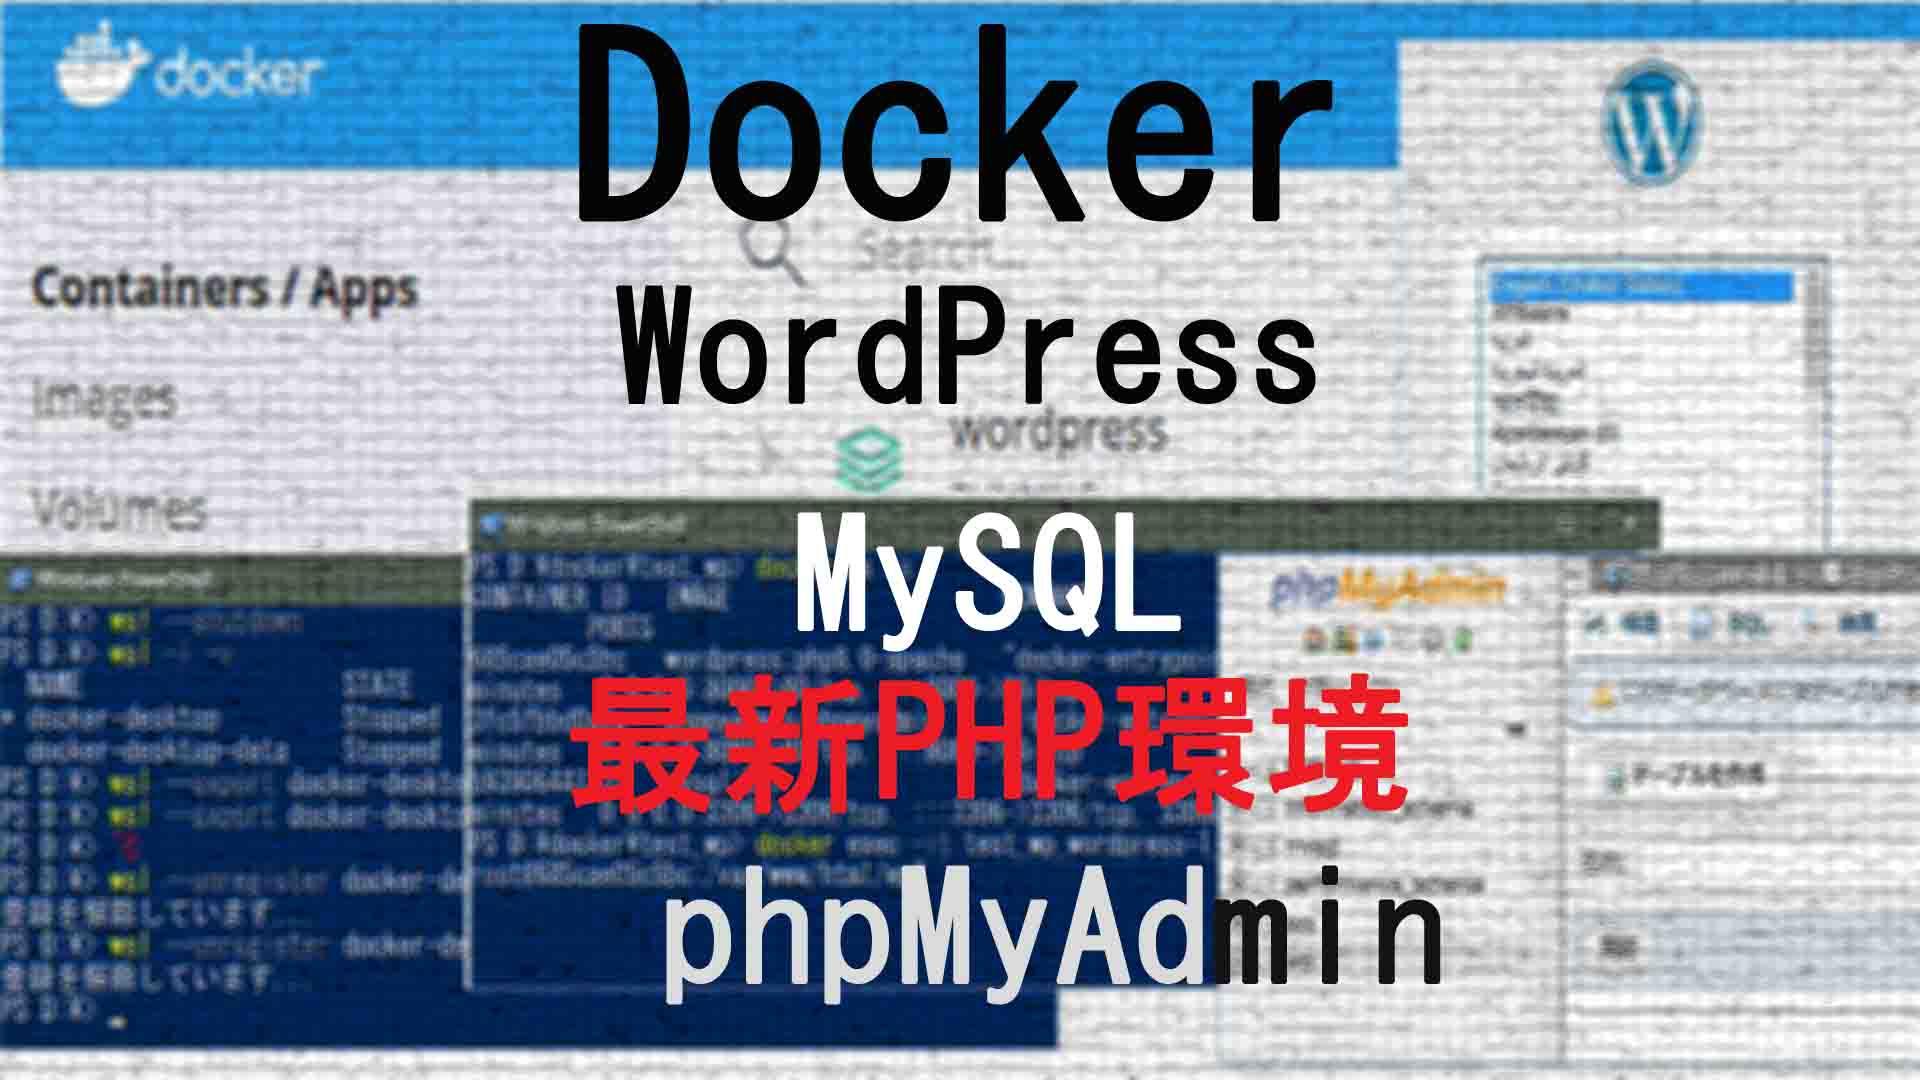 Docker使って最新PHPでWordPress構築